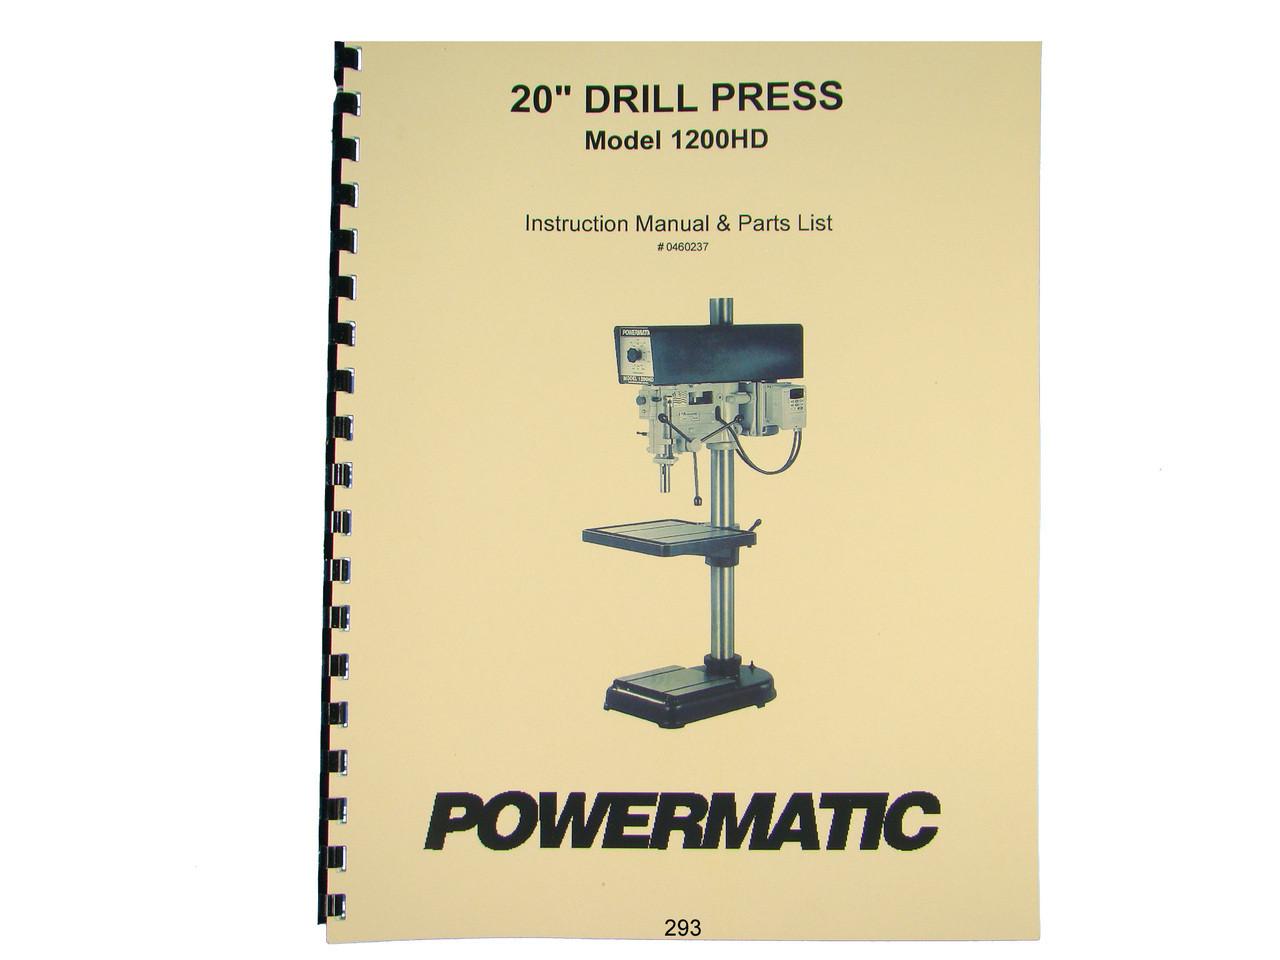 Powermatic Model 1200HD Drill Press Operating Instruction & Parts Manual  *293